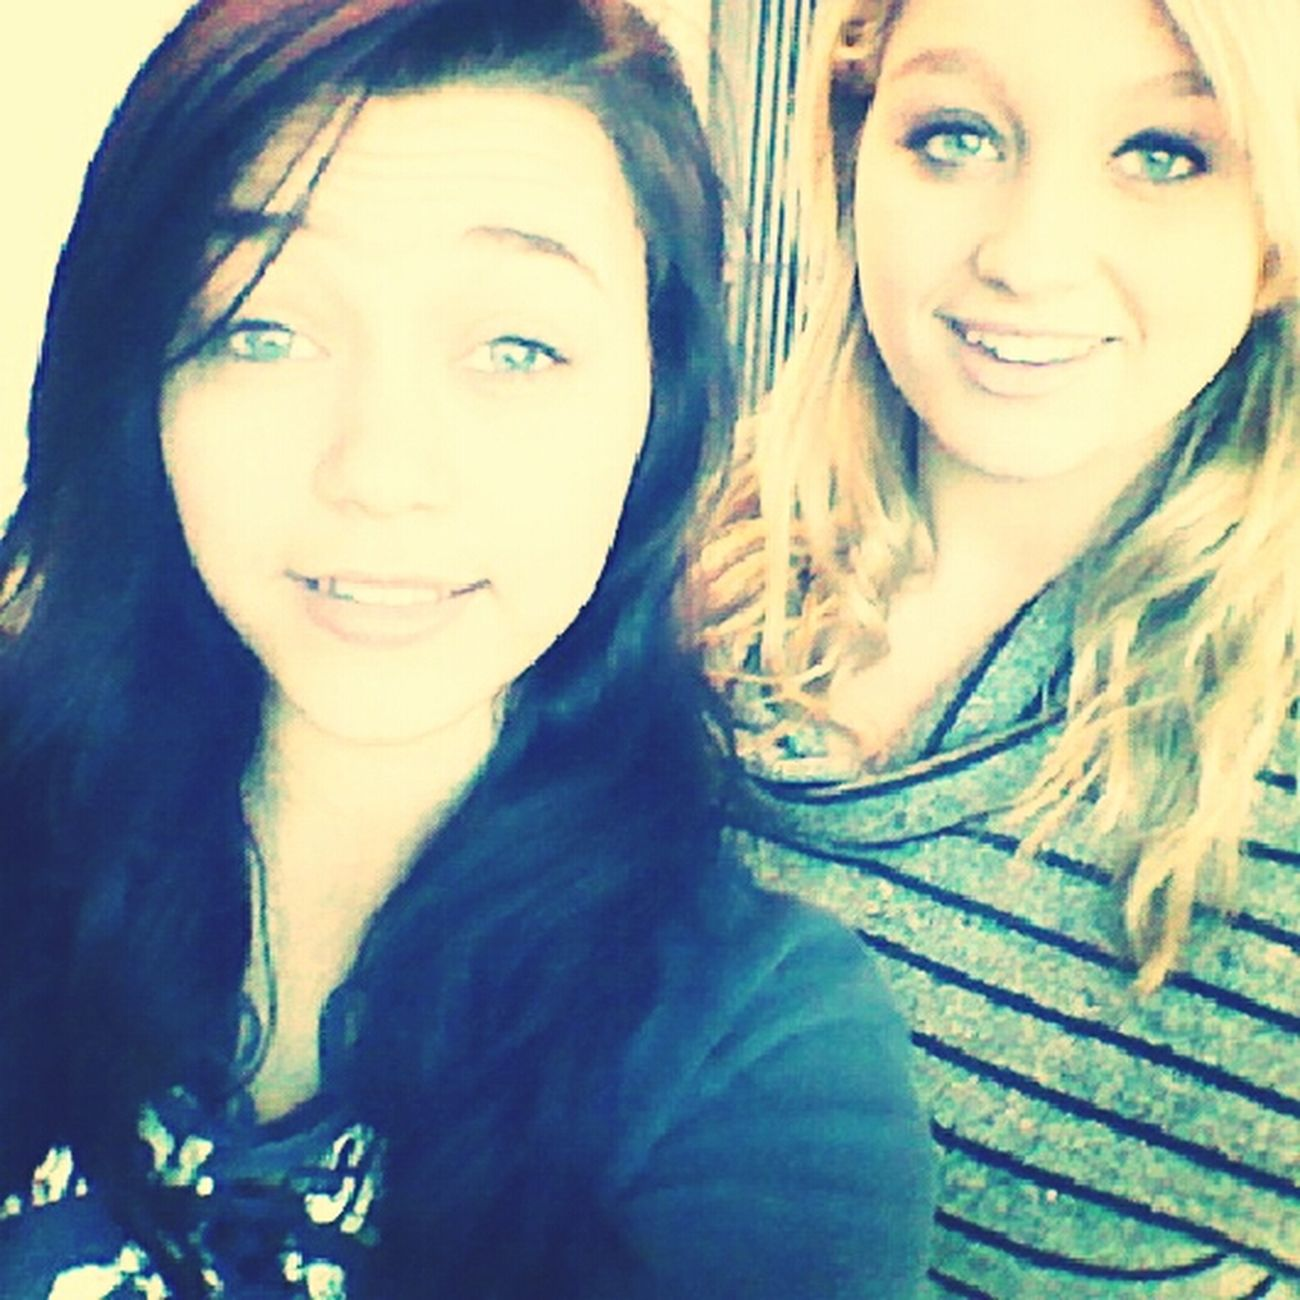 With Kerrin